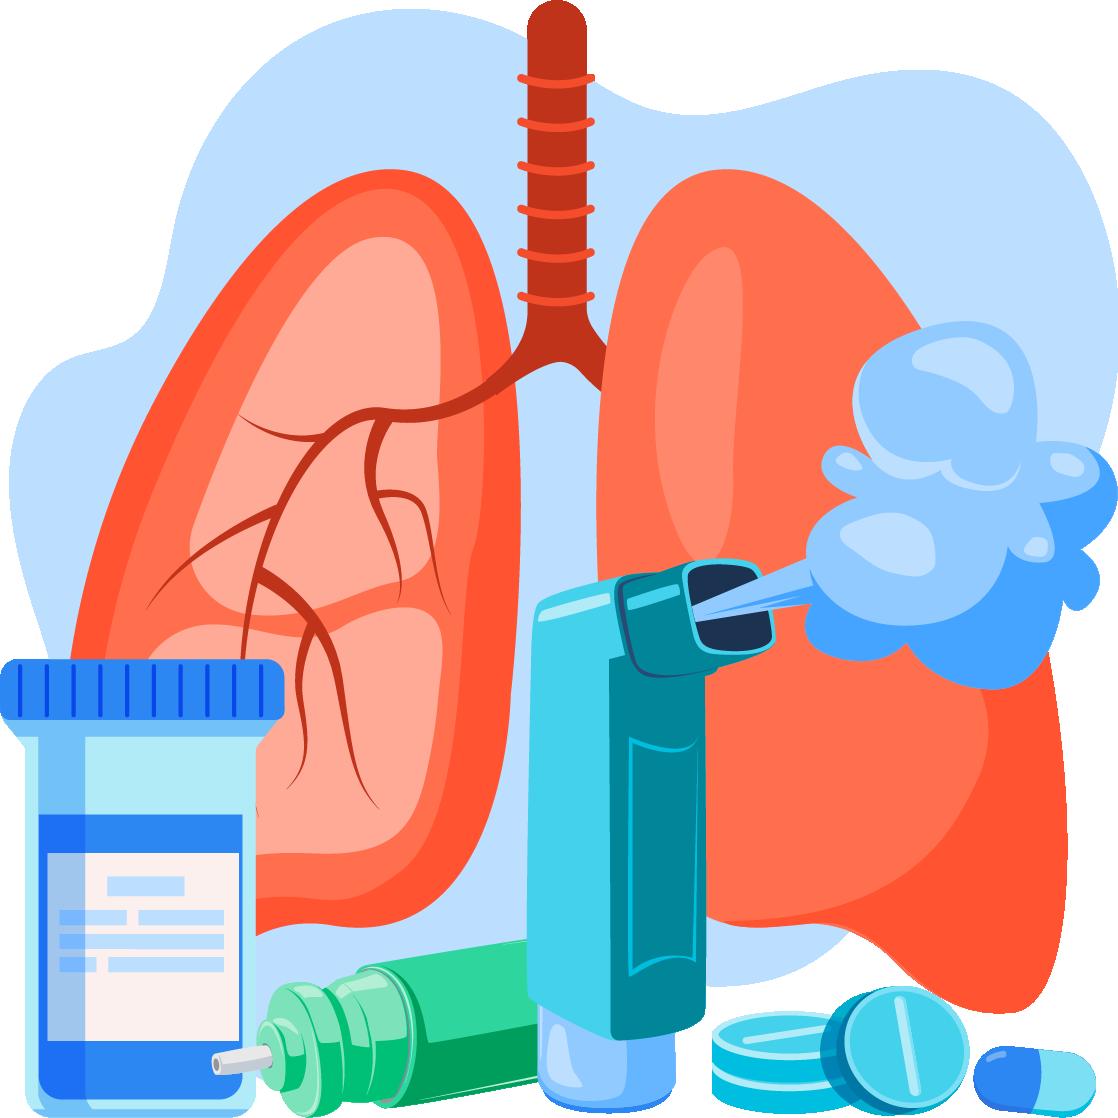 Anda rasa seperti alami tanda-tanda asma? Periksa risiko anda di sini!